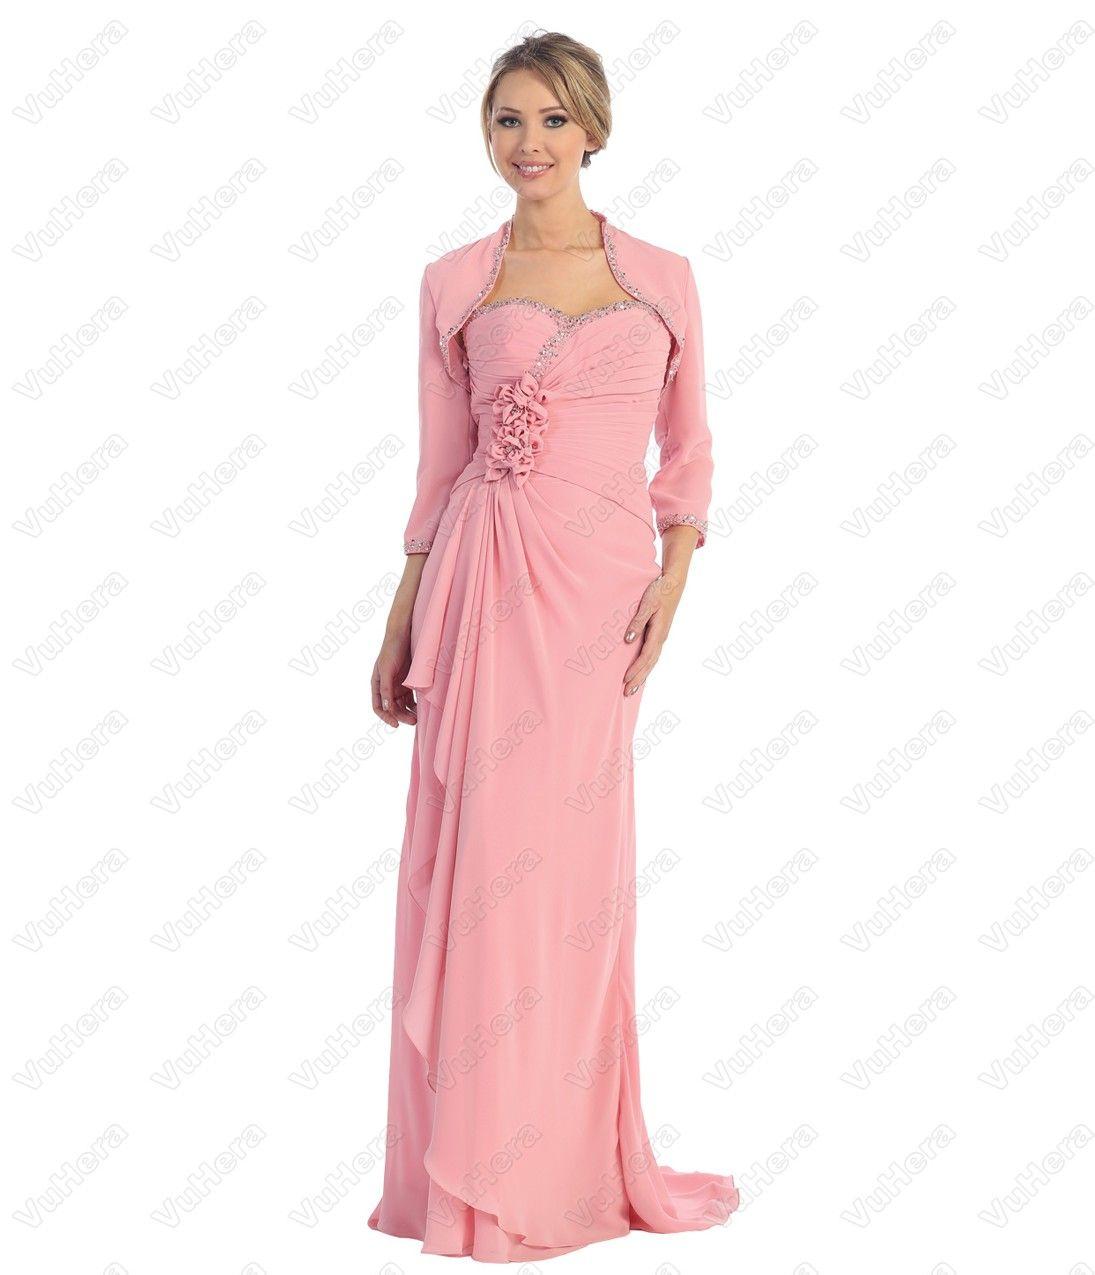 Rose Chiffon Prom Dress | Prom Dresses | Pinterest | Prom, Cheap ...